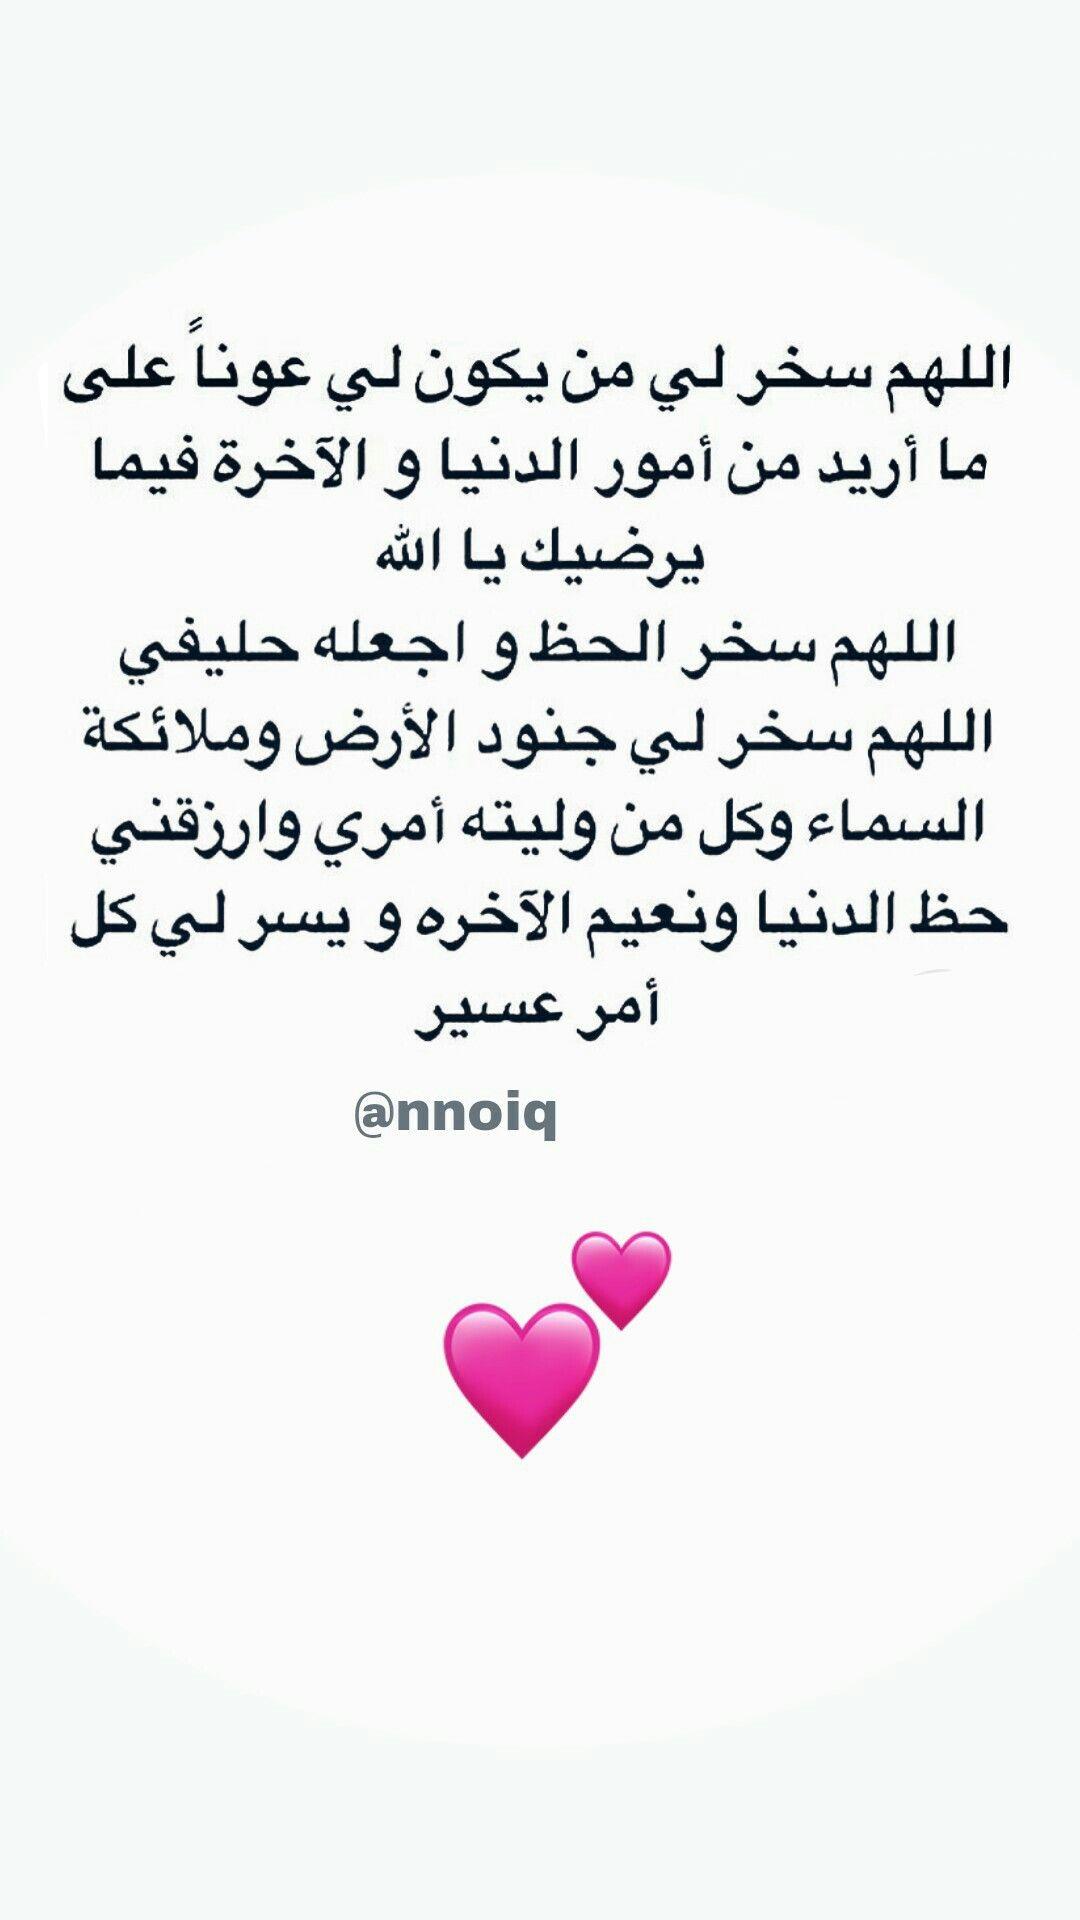 Pin By امة الرحمان On اقتباسات من كتب أعجبتني Quran Quotes Love Quran Quotes Words Quotes